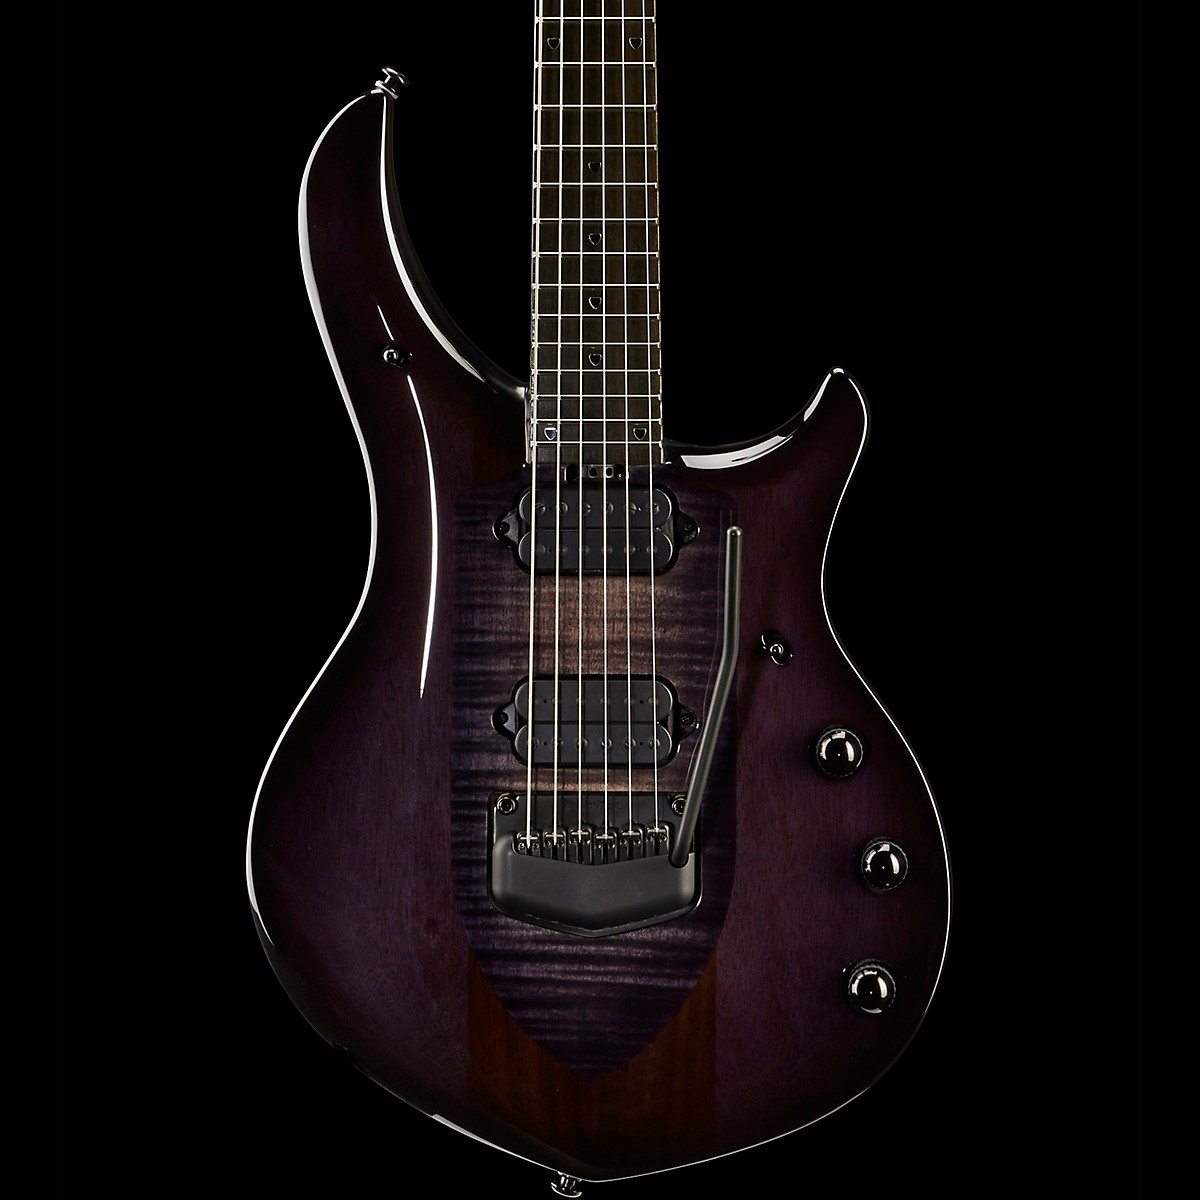 Ernie Ball Music Man John Petrucci Monarchy Majesty Electric Guitar